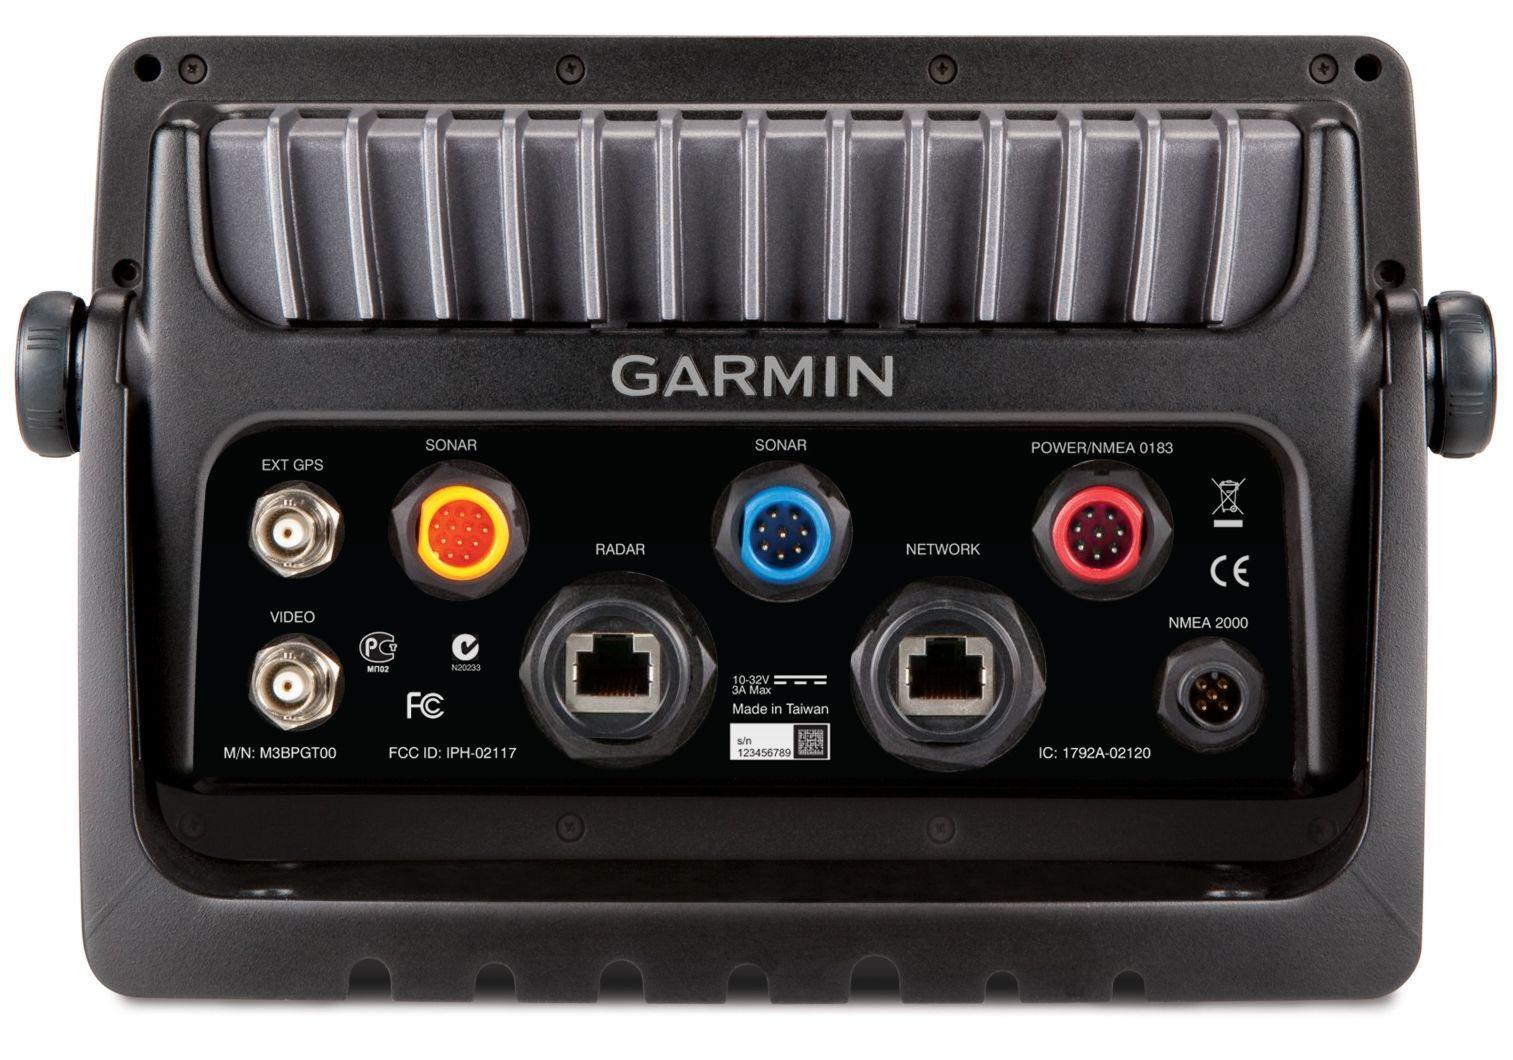 Garmin_7X1_rear_case_view_update_11 15 2012 panbo the marine electronics hub new garmin gpsmap 741sx, 741 Garmin 741 at honlapkeszites.co